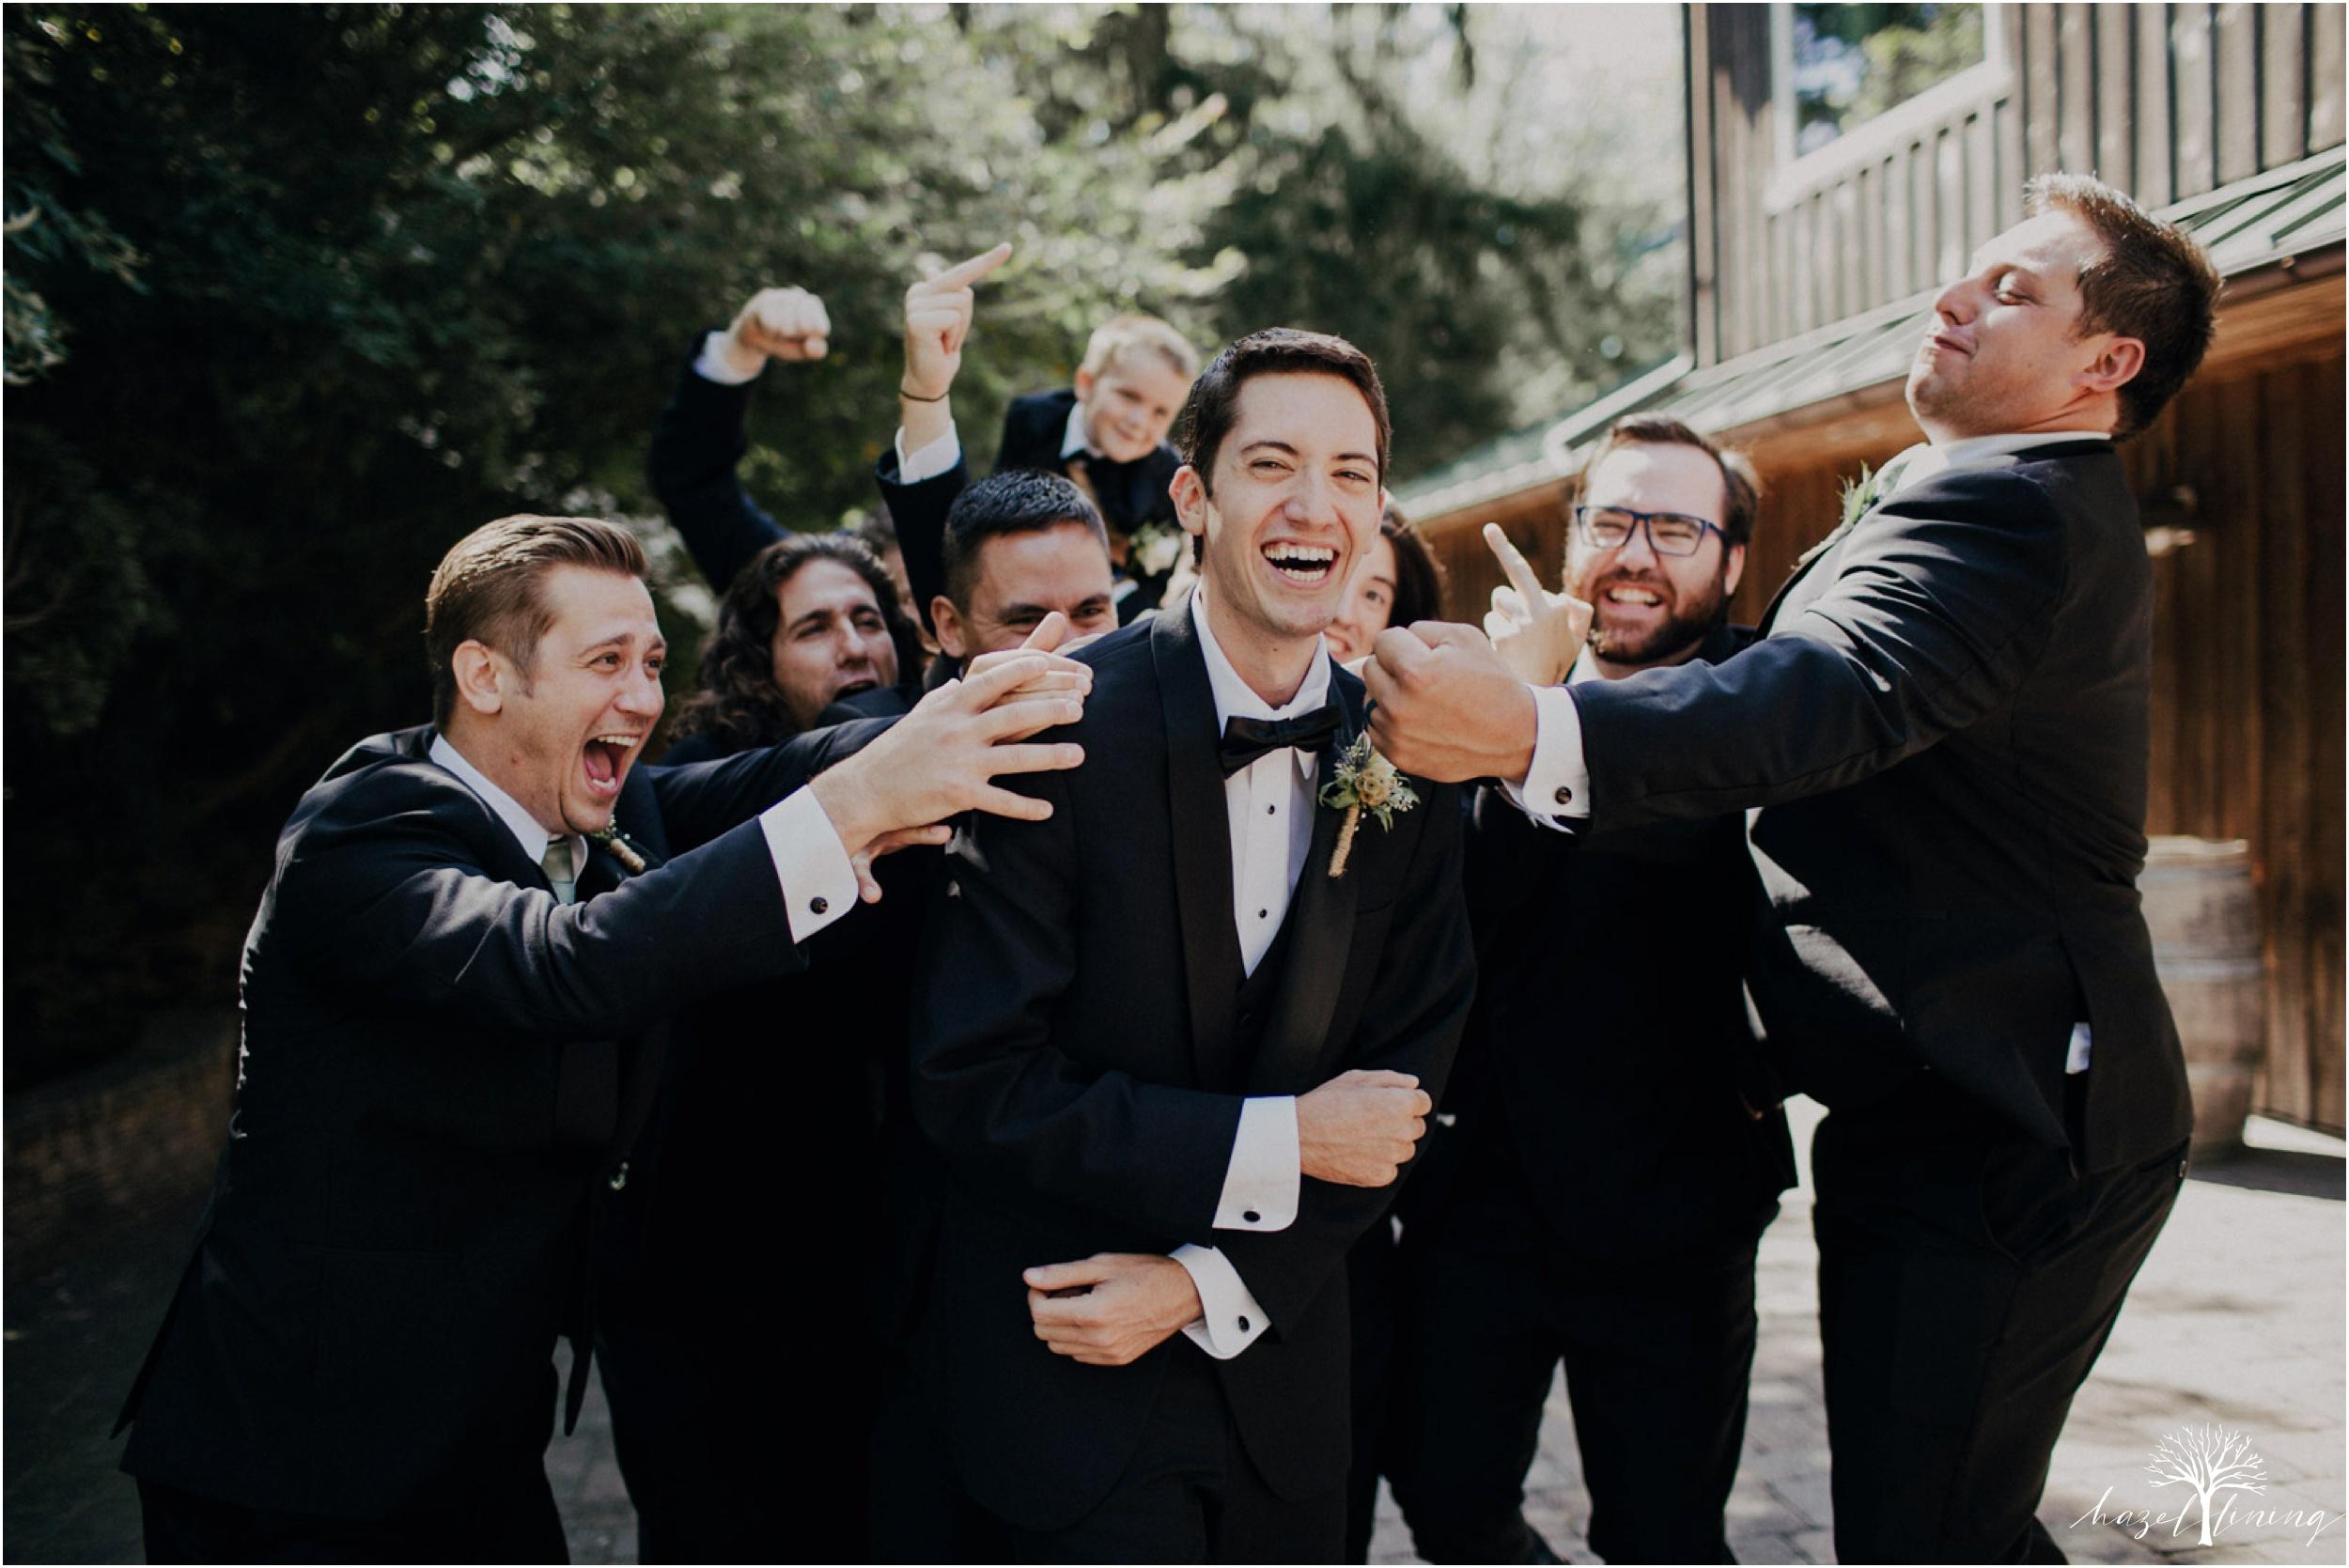 maureen-hepner-anthony-giordano-rose-bank-winery-newtow-pennsylvania-luxury-summer-wedding-hazel-lining-photography-destination-elopement-wedding-engagement-photography_0052.jpg